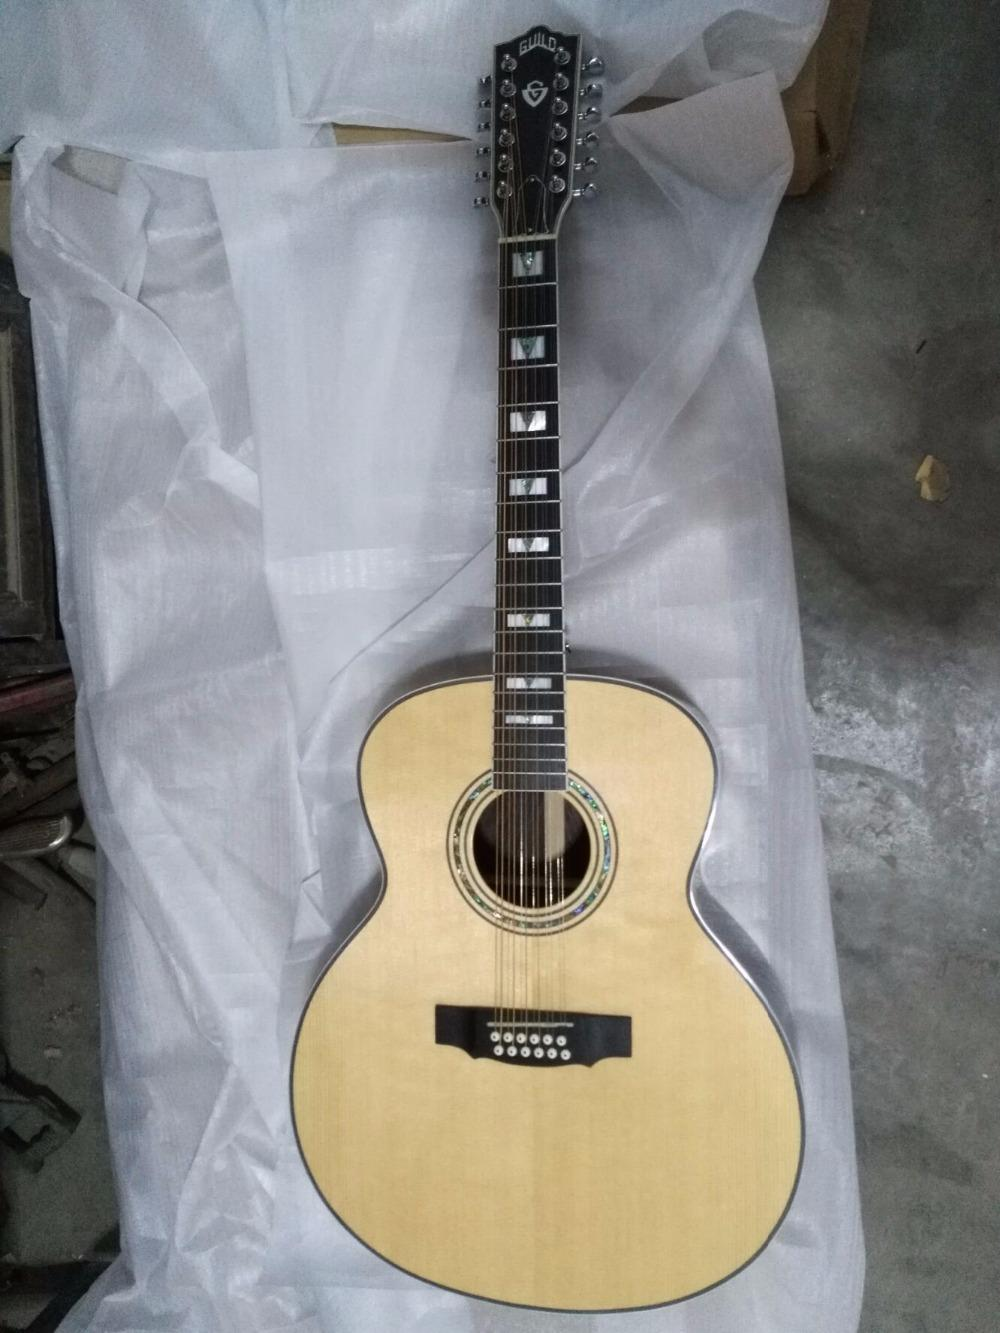 8sounds music 12 strings best quality solid cedar wood 12 string jumbo acoustic guitar acoustic. Black Bedroom Furniture Sets. Home Design Ideas